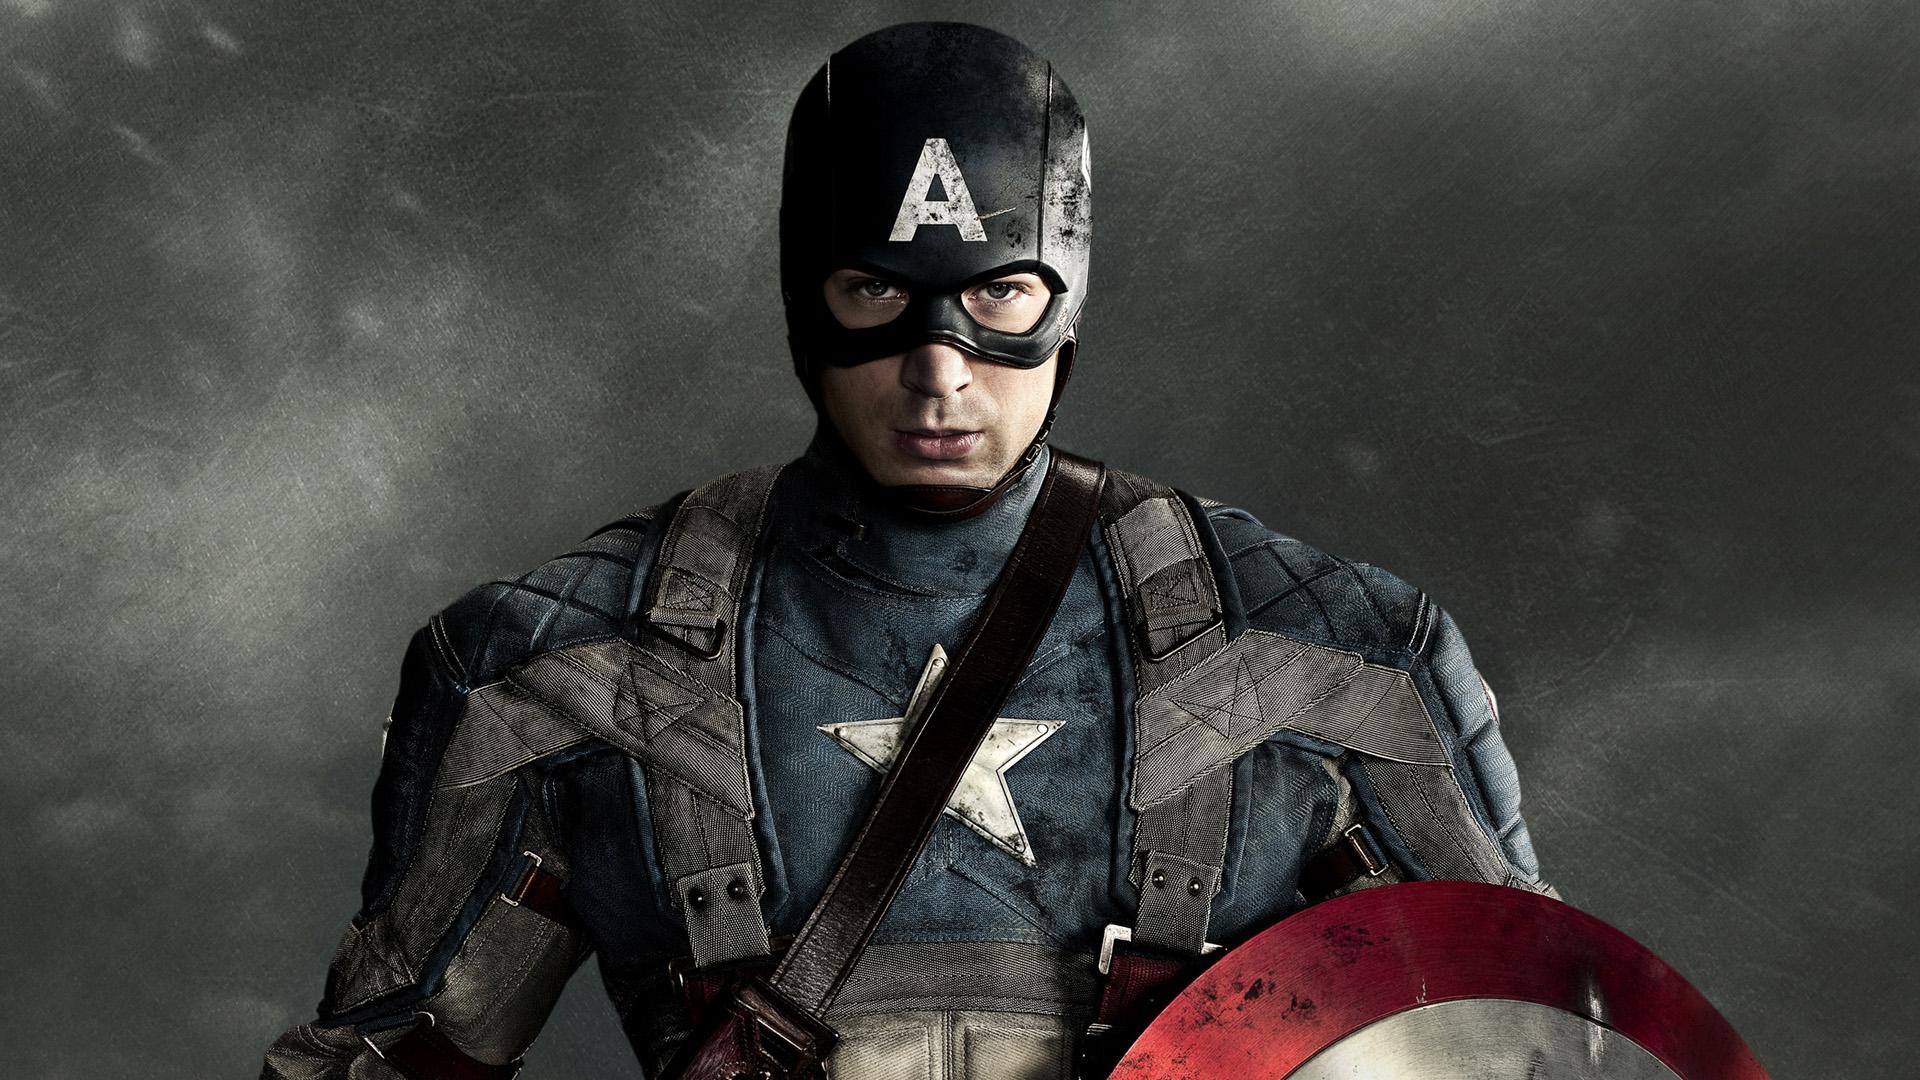 captain-america-the-first-avenger-50104a9ddbbaf